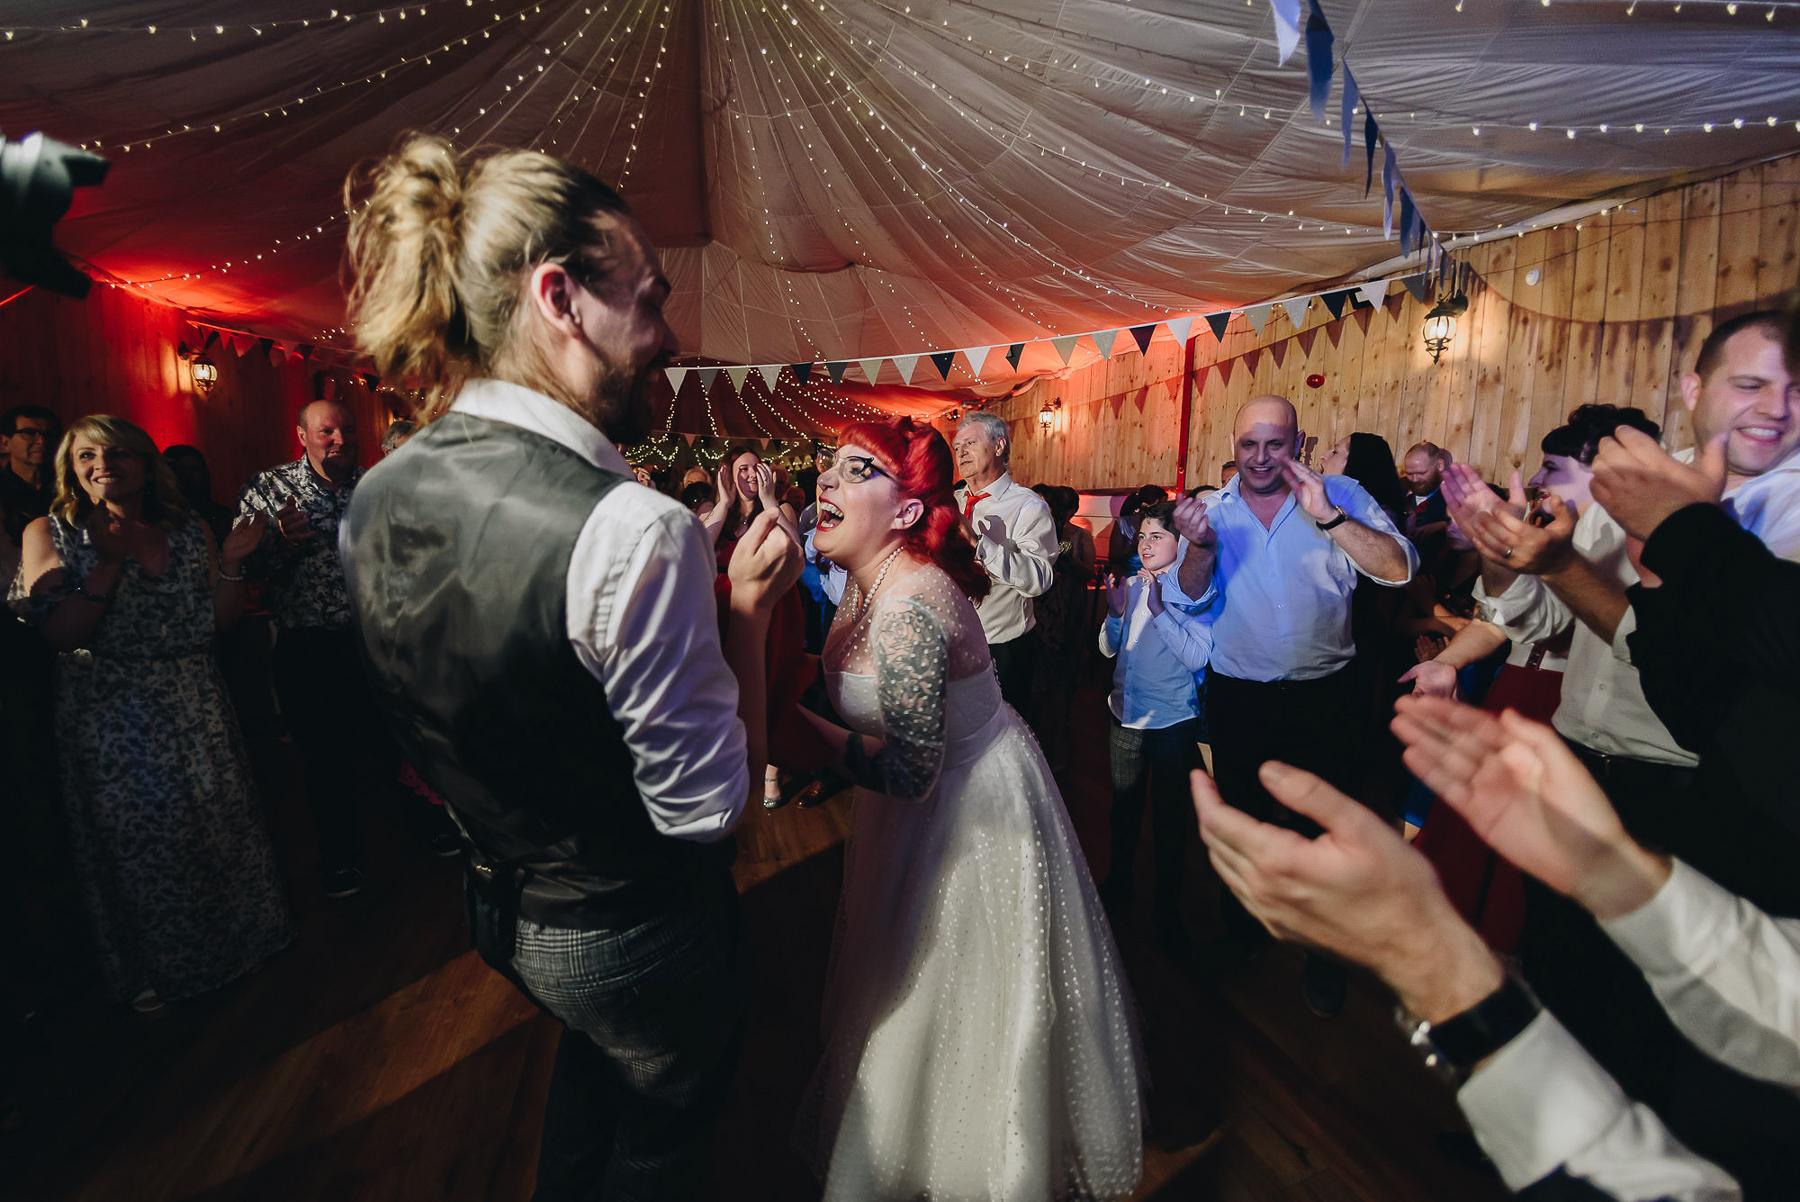 Wellbeing_Farm_Wedding_Photography_The_Pin-Up_Bride_Lara_Shaun-180.jpg